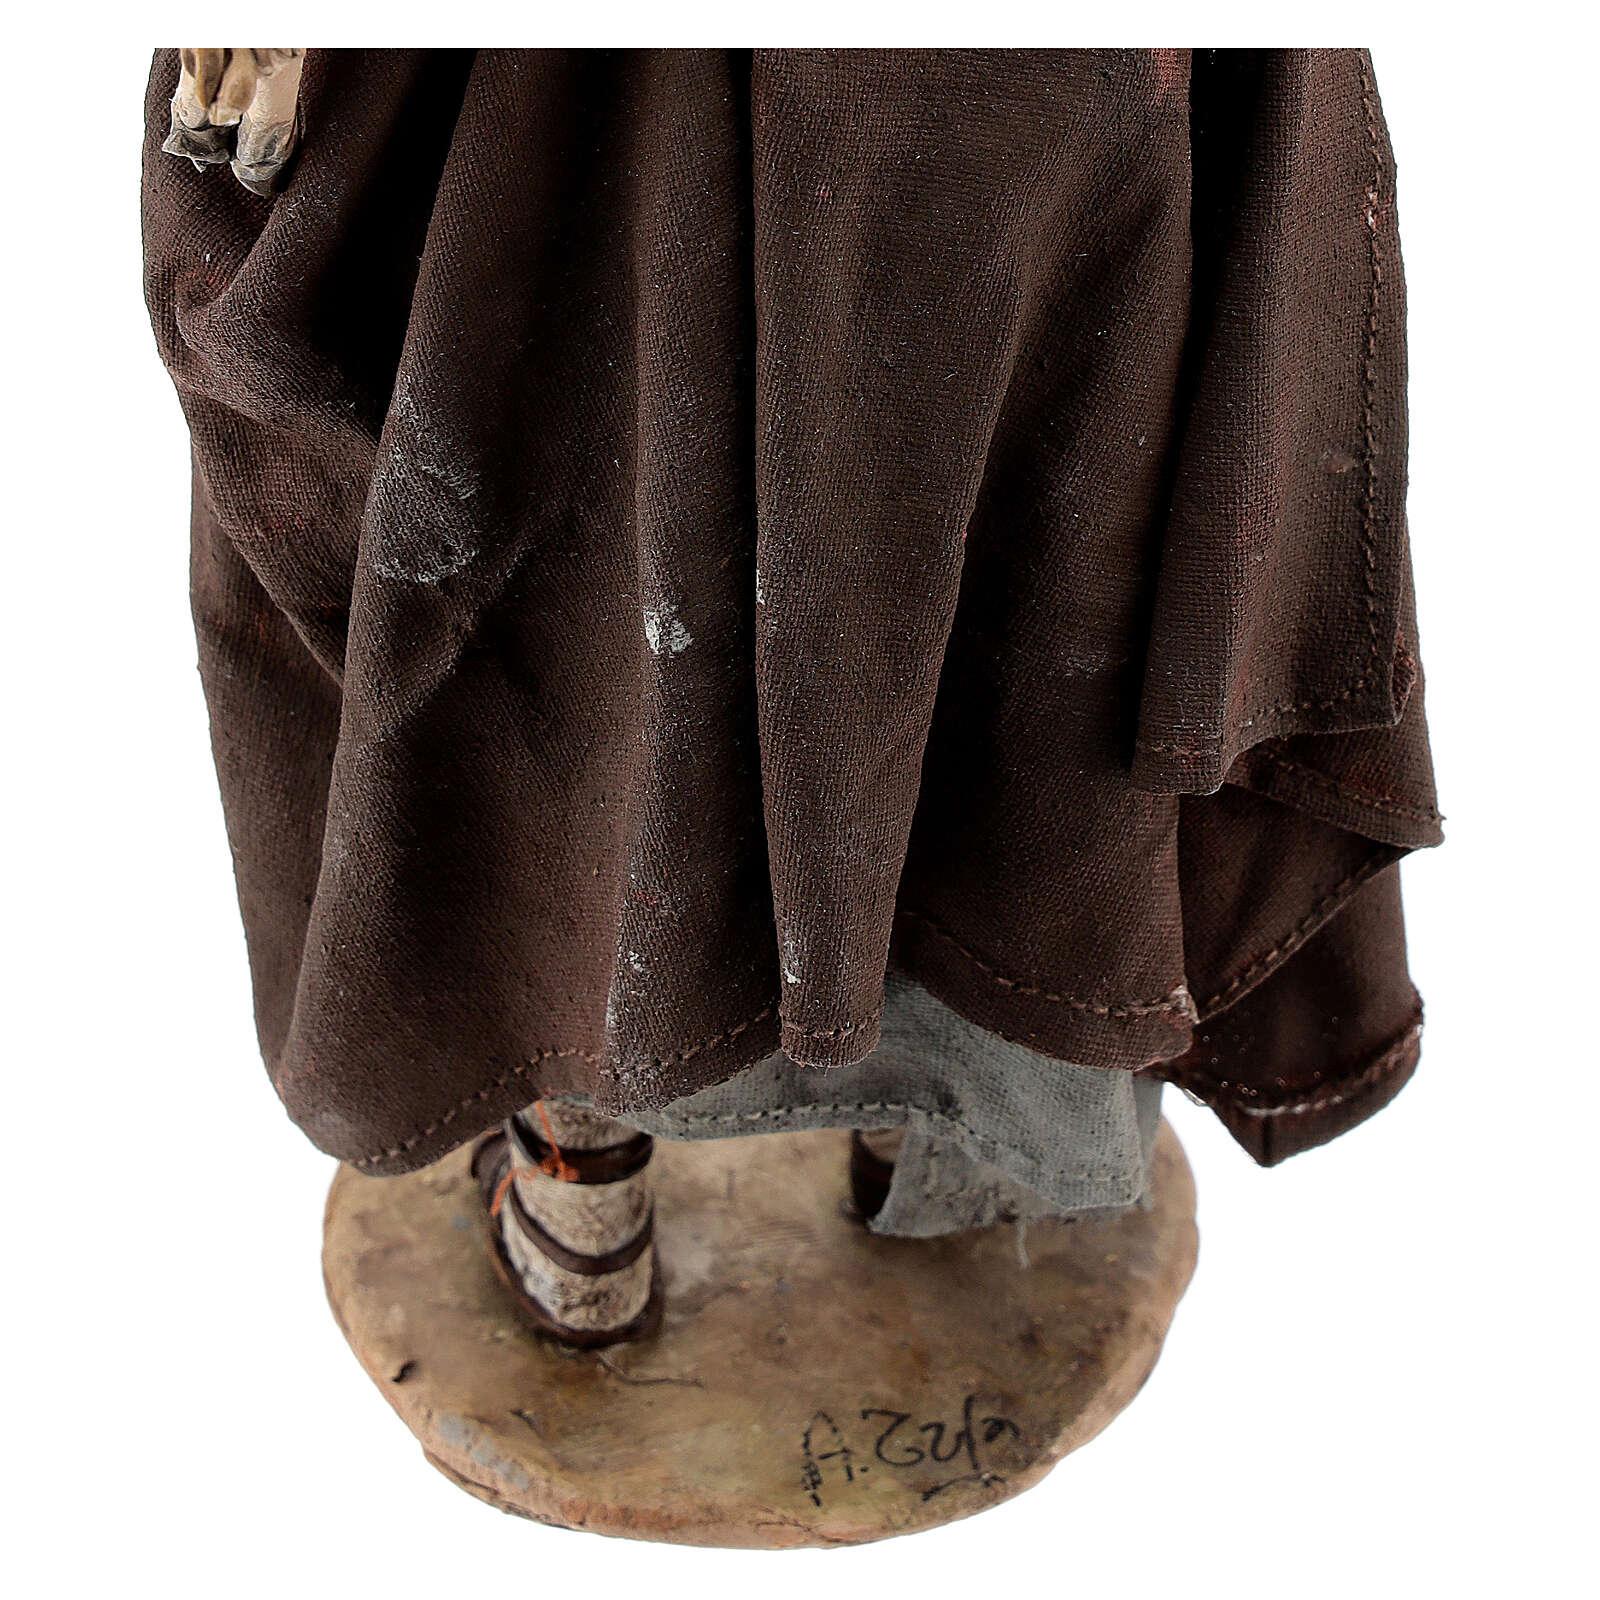 Buon pastore 18 cm Angela Tripi terracotta 4